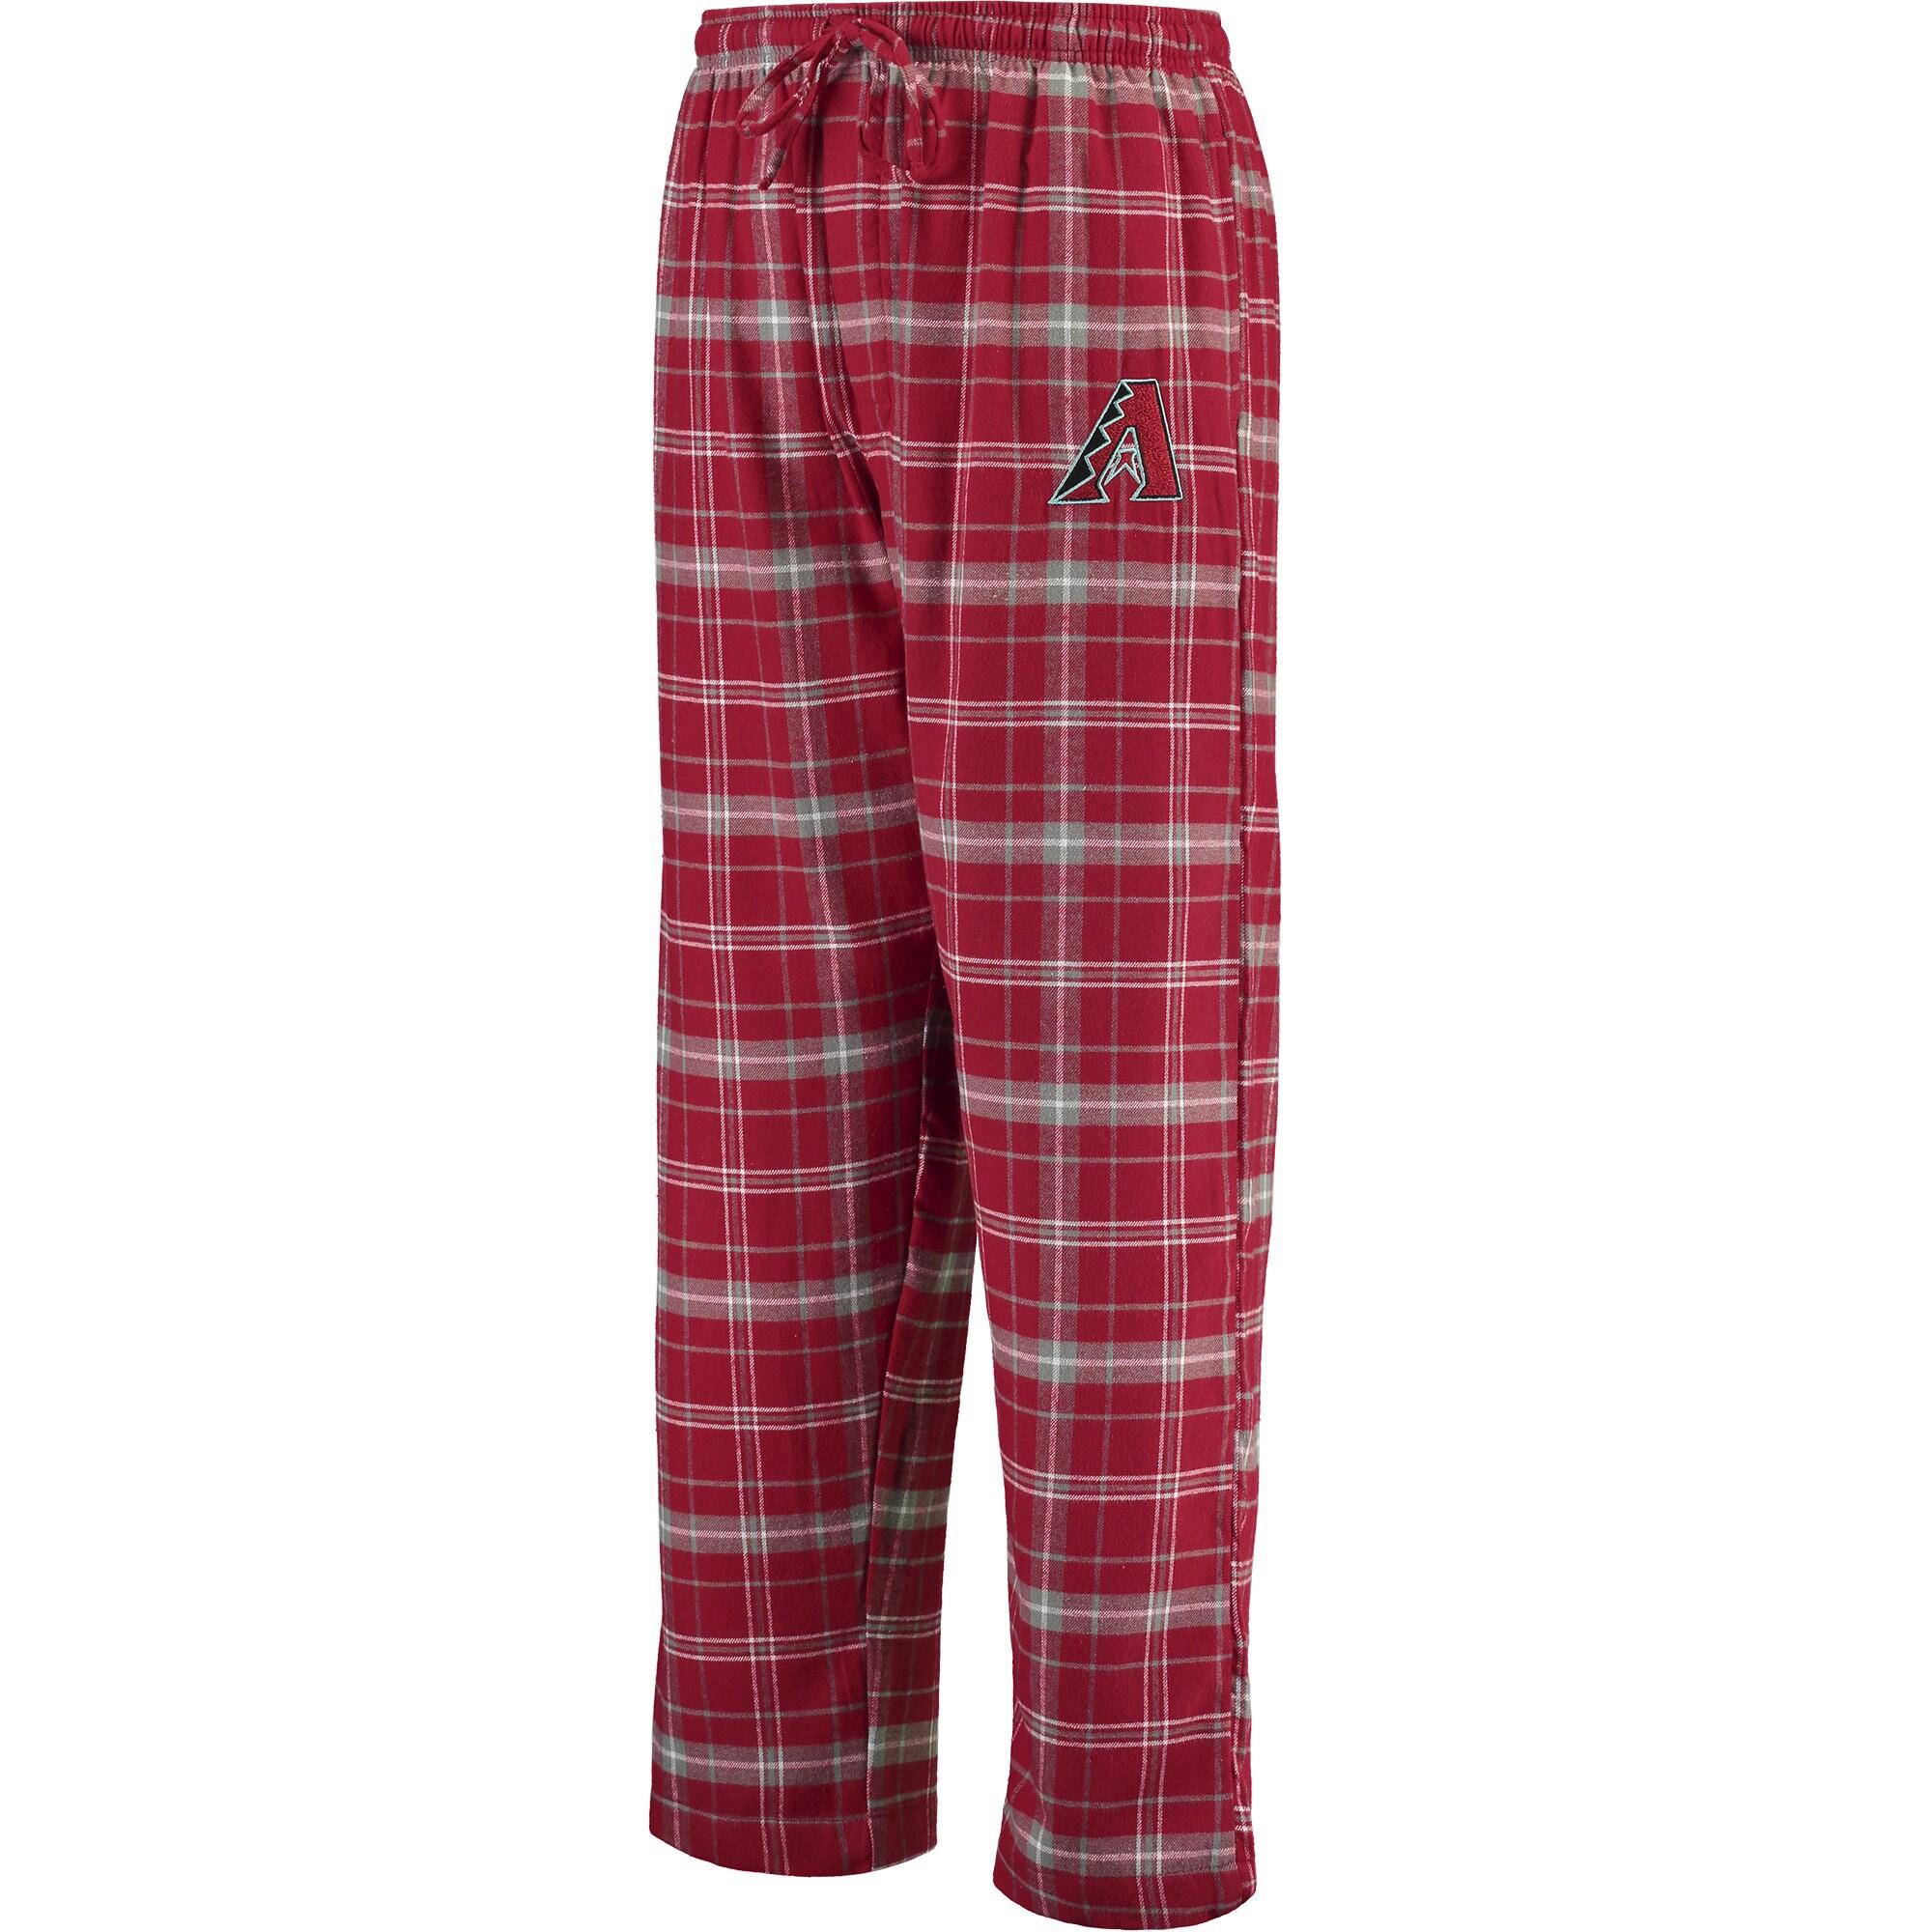 Arizona Diamondbacks Concepts Sport Ultimate Plaid Flannel Pants - Cardinal/Gray